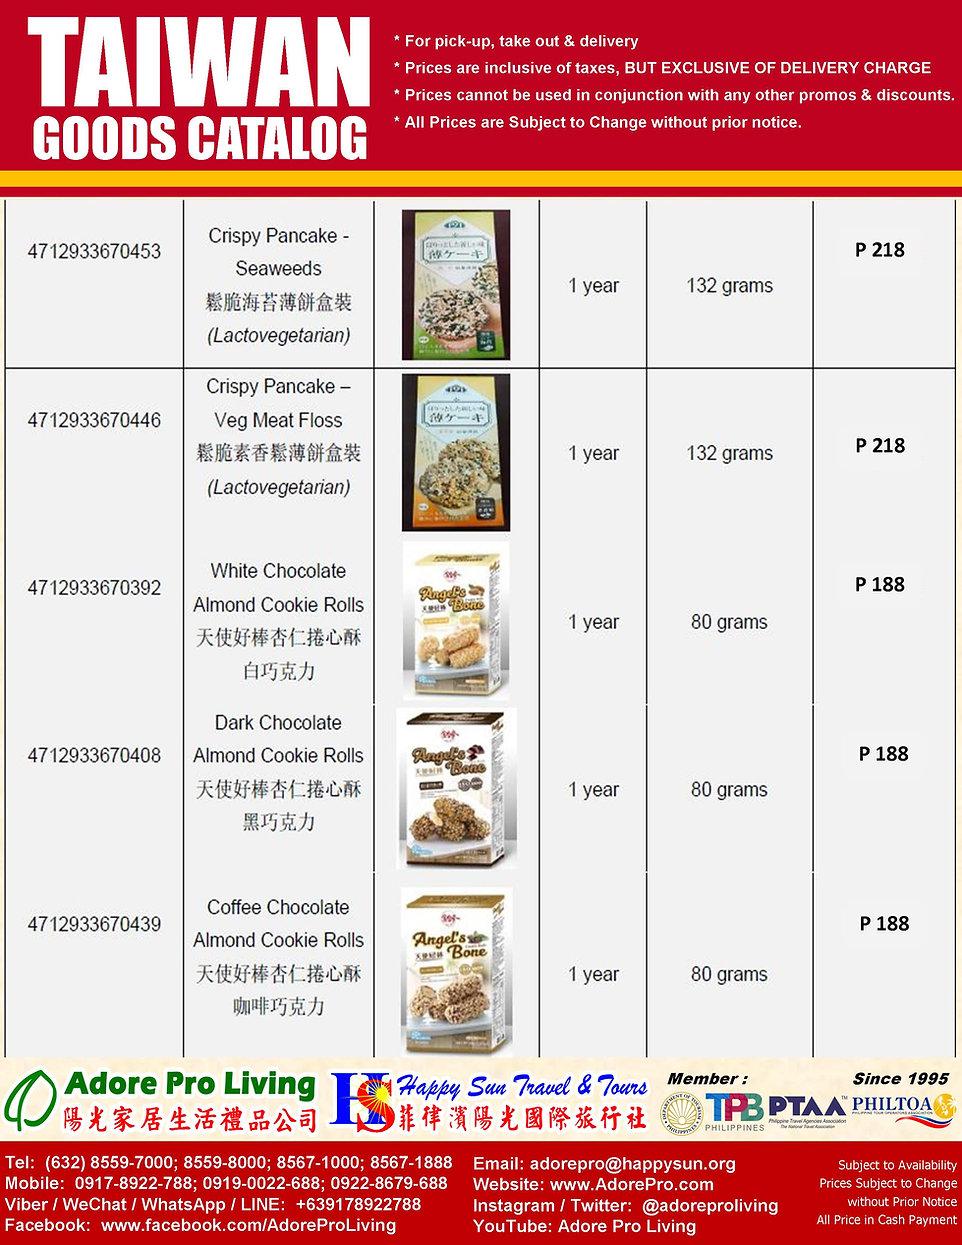 P25_Taiwan Goods Catalog_20200929.jpg